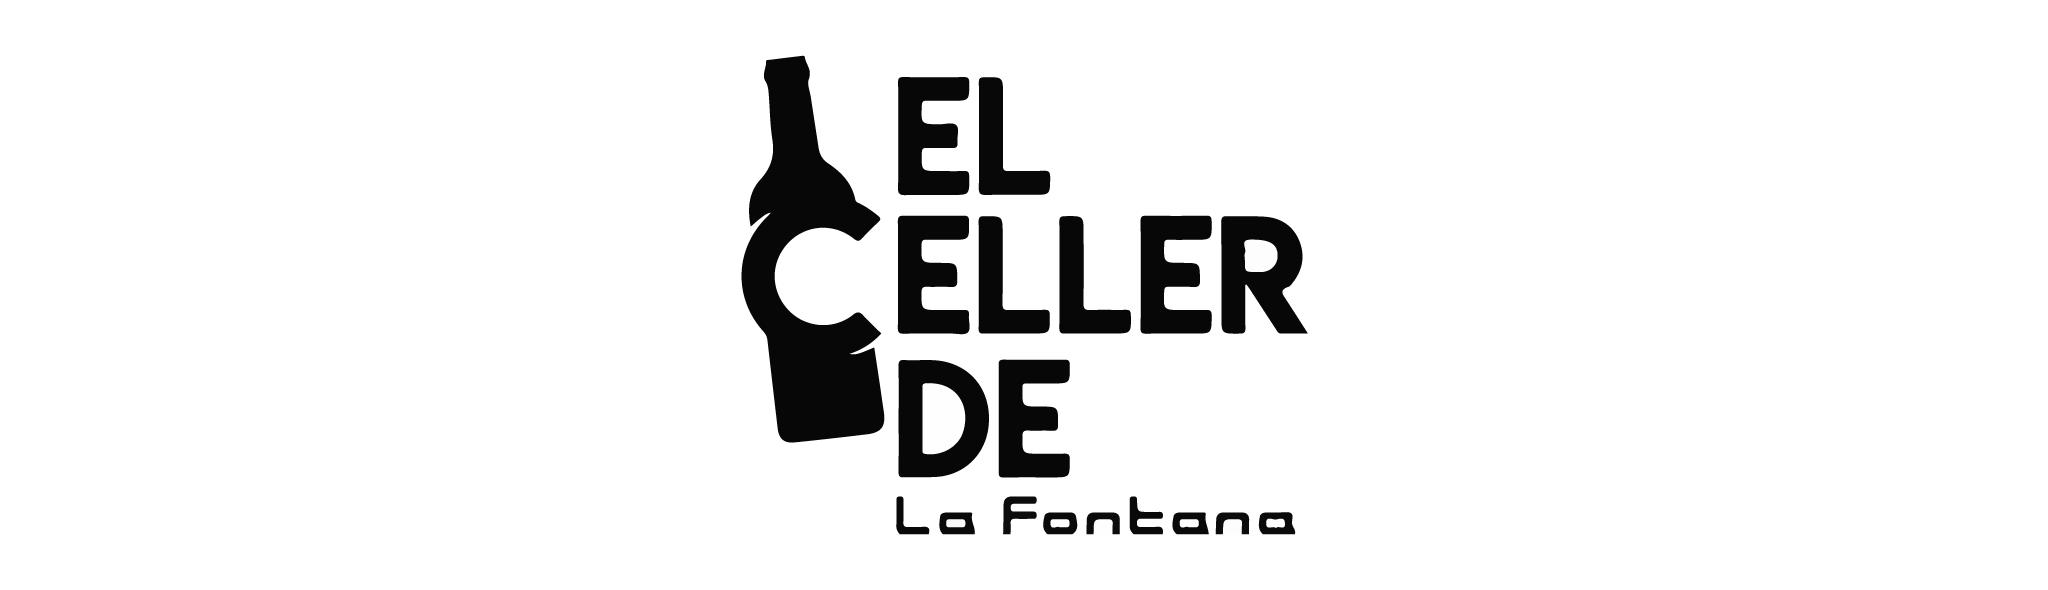 Logotipo de El Celler de La Fontana